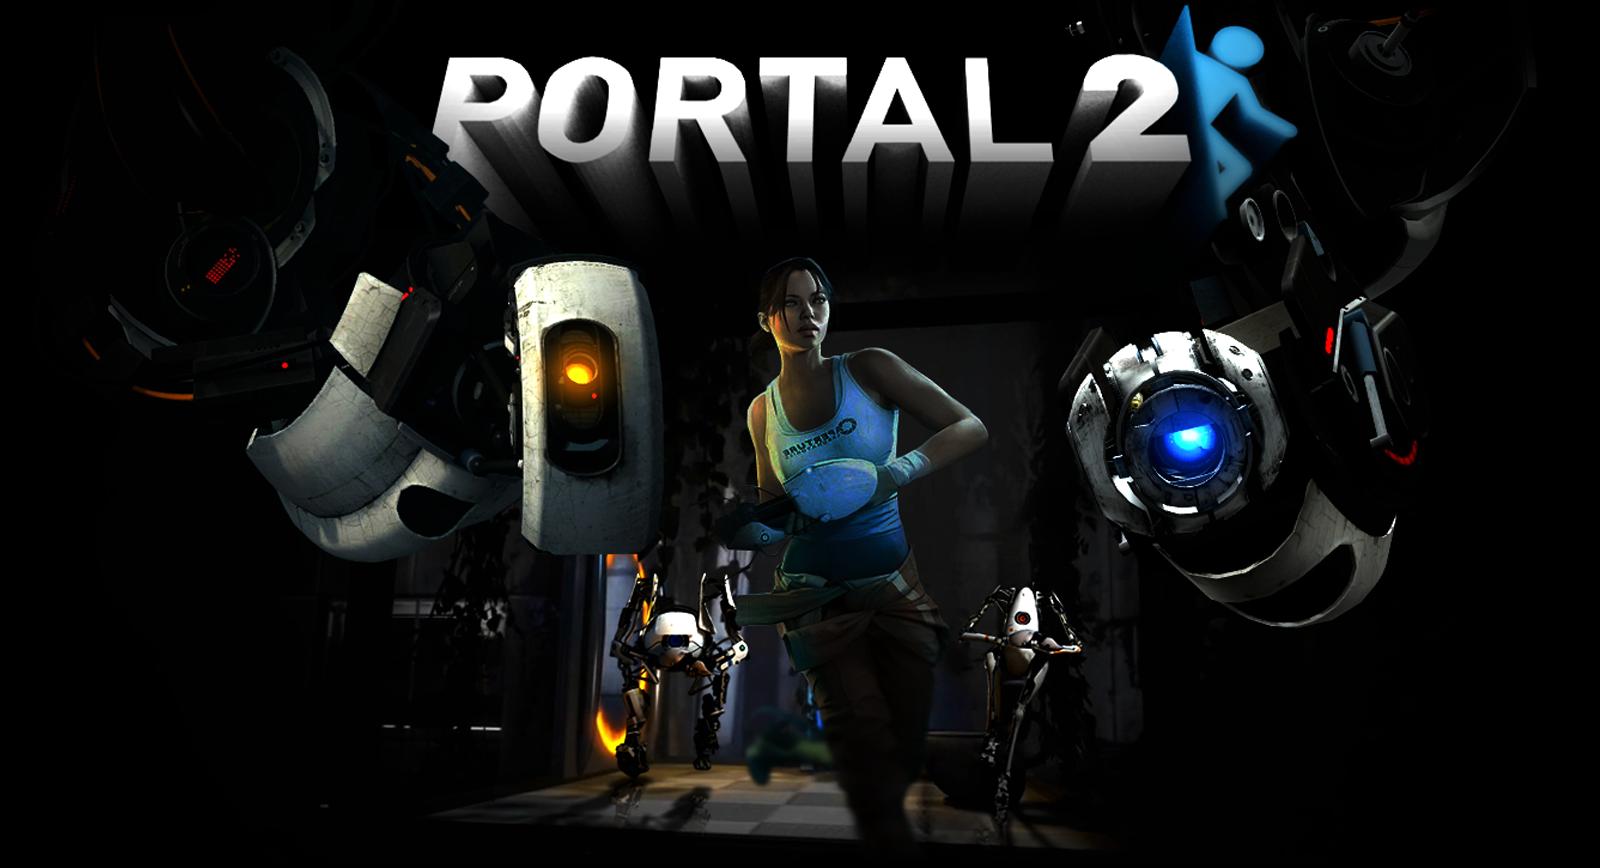 Portal 2 Desktop Background icancopewithanything 1600x868